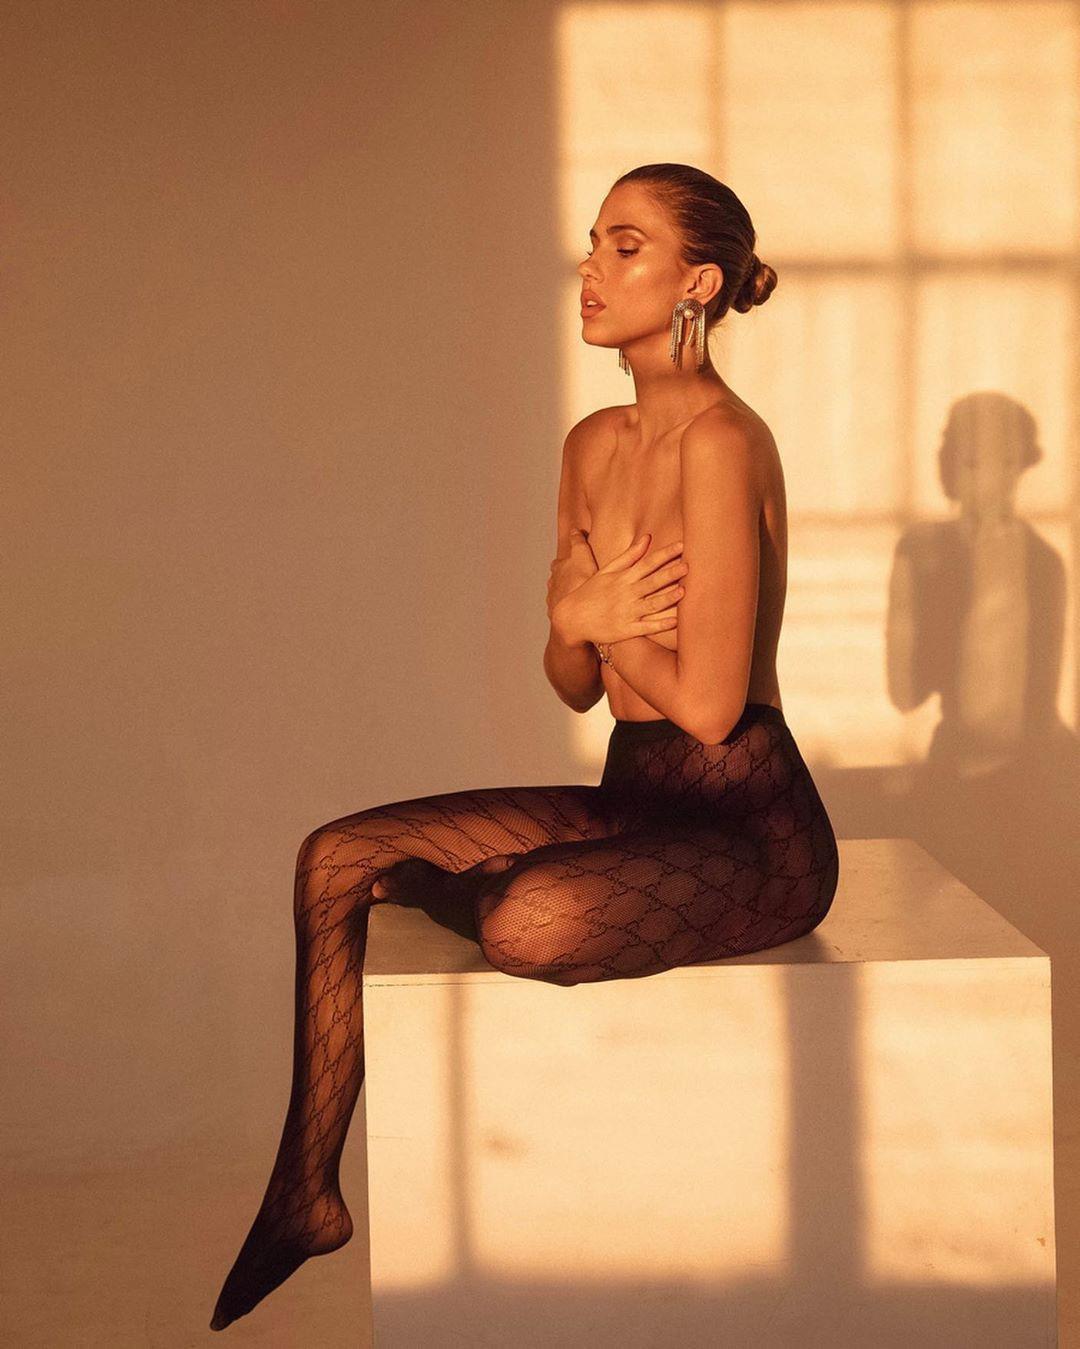 Kara Del Toro tights instagram fashion, girls instagram photos, hot thighs